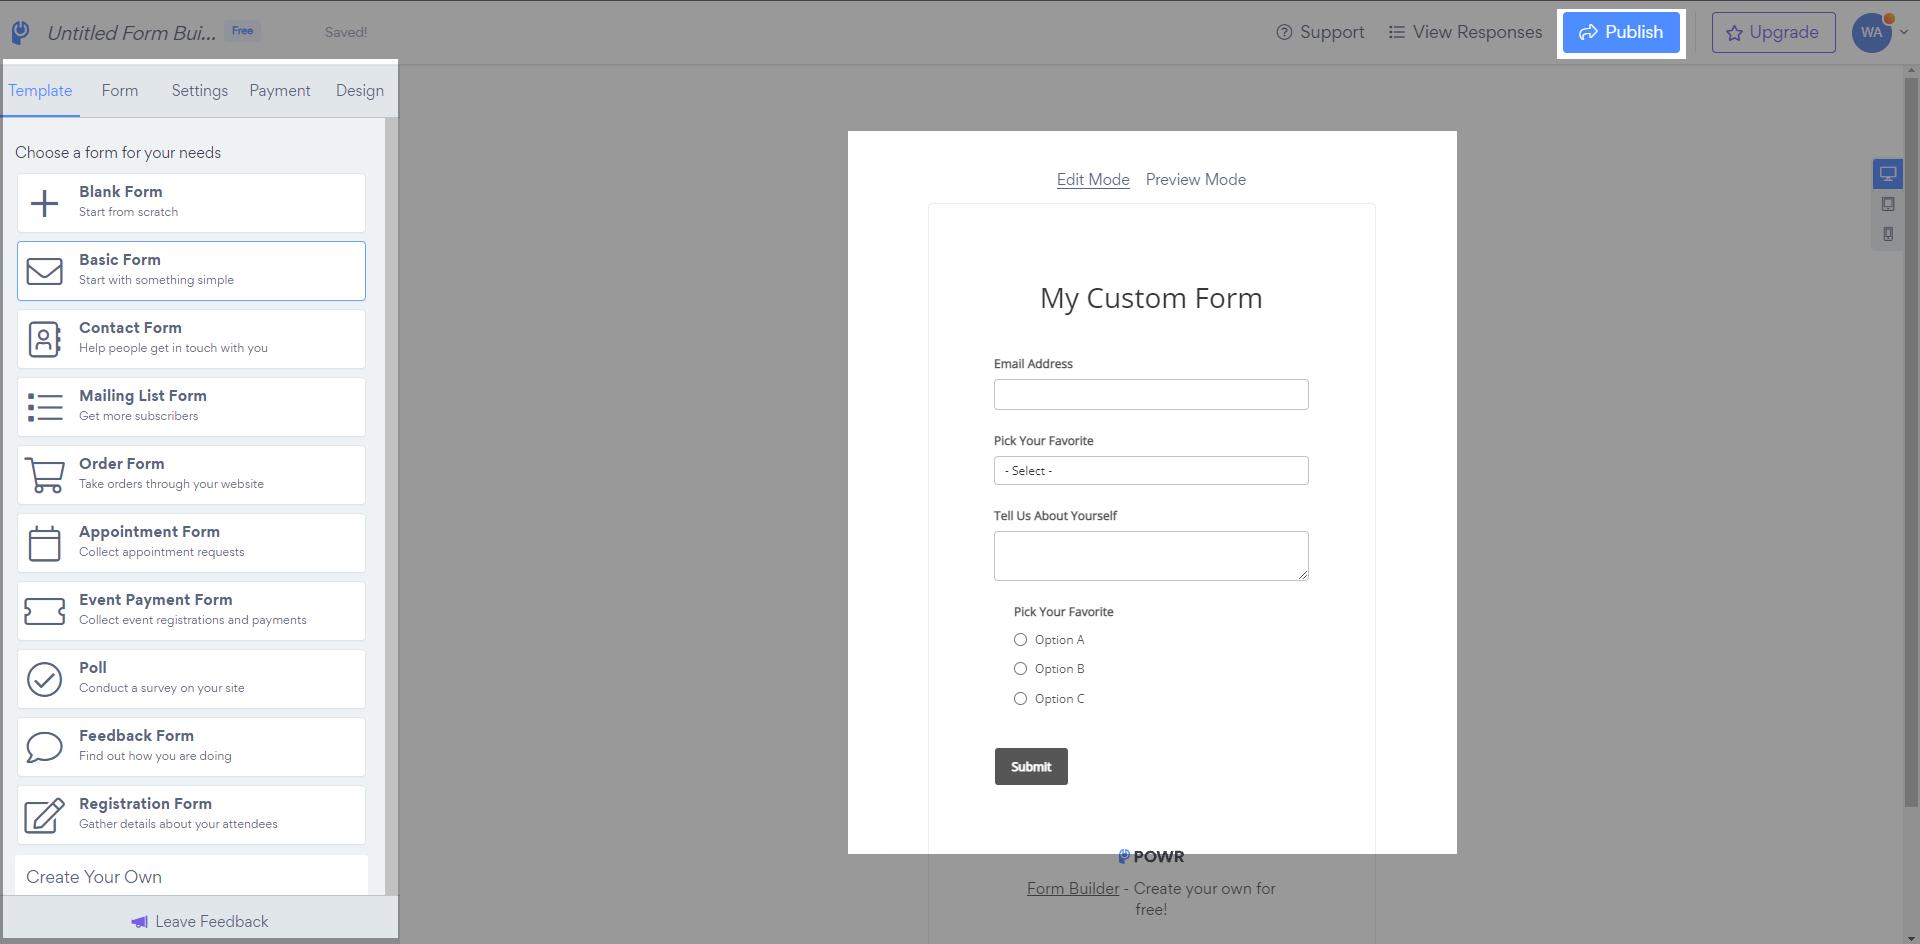 Configurate POWR Form Builder app